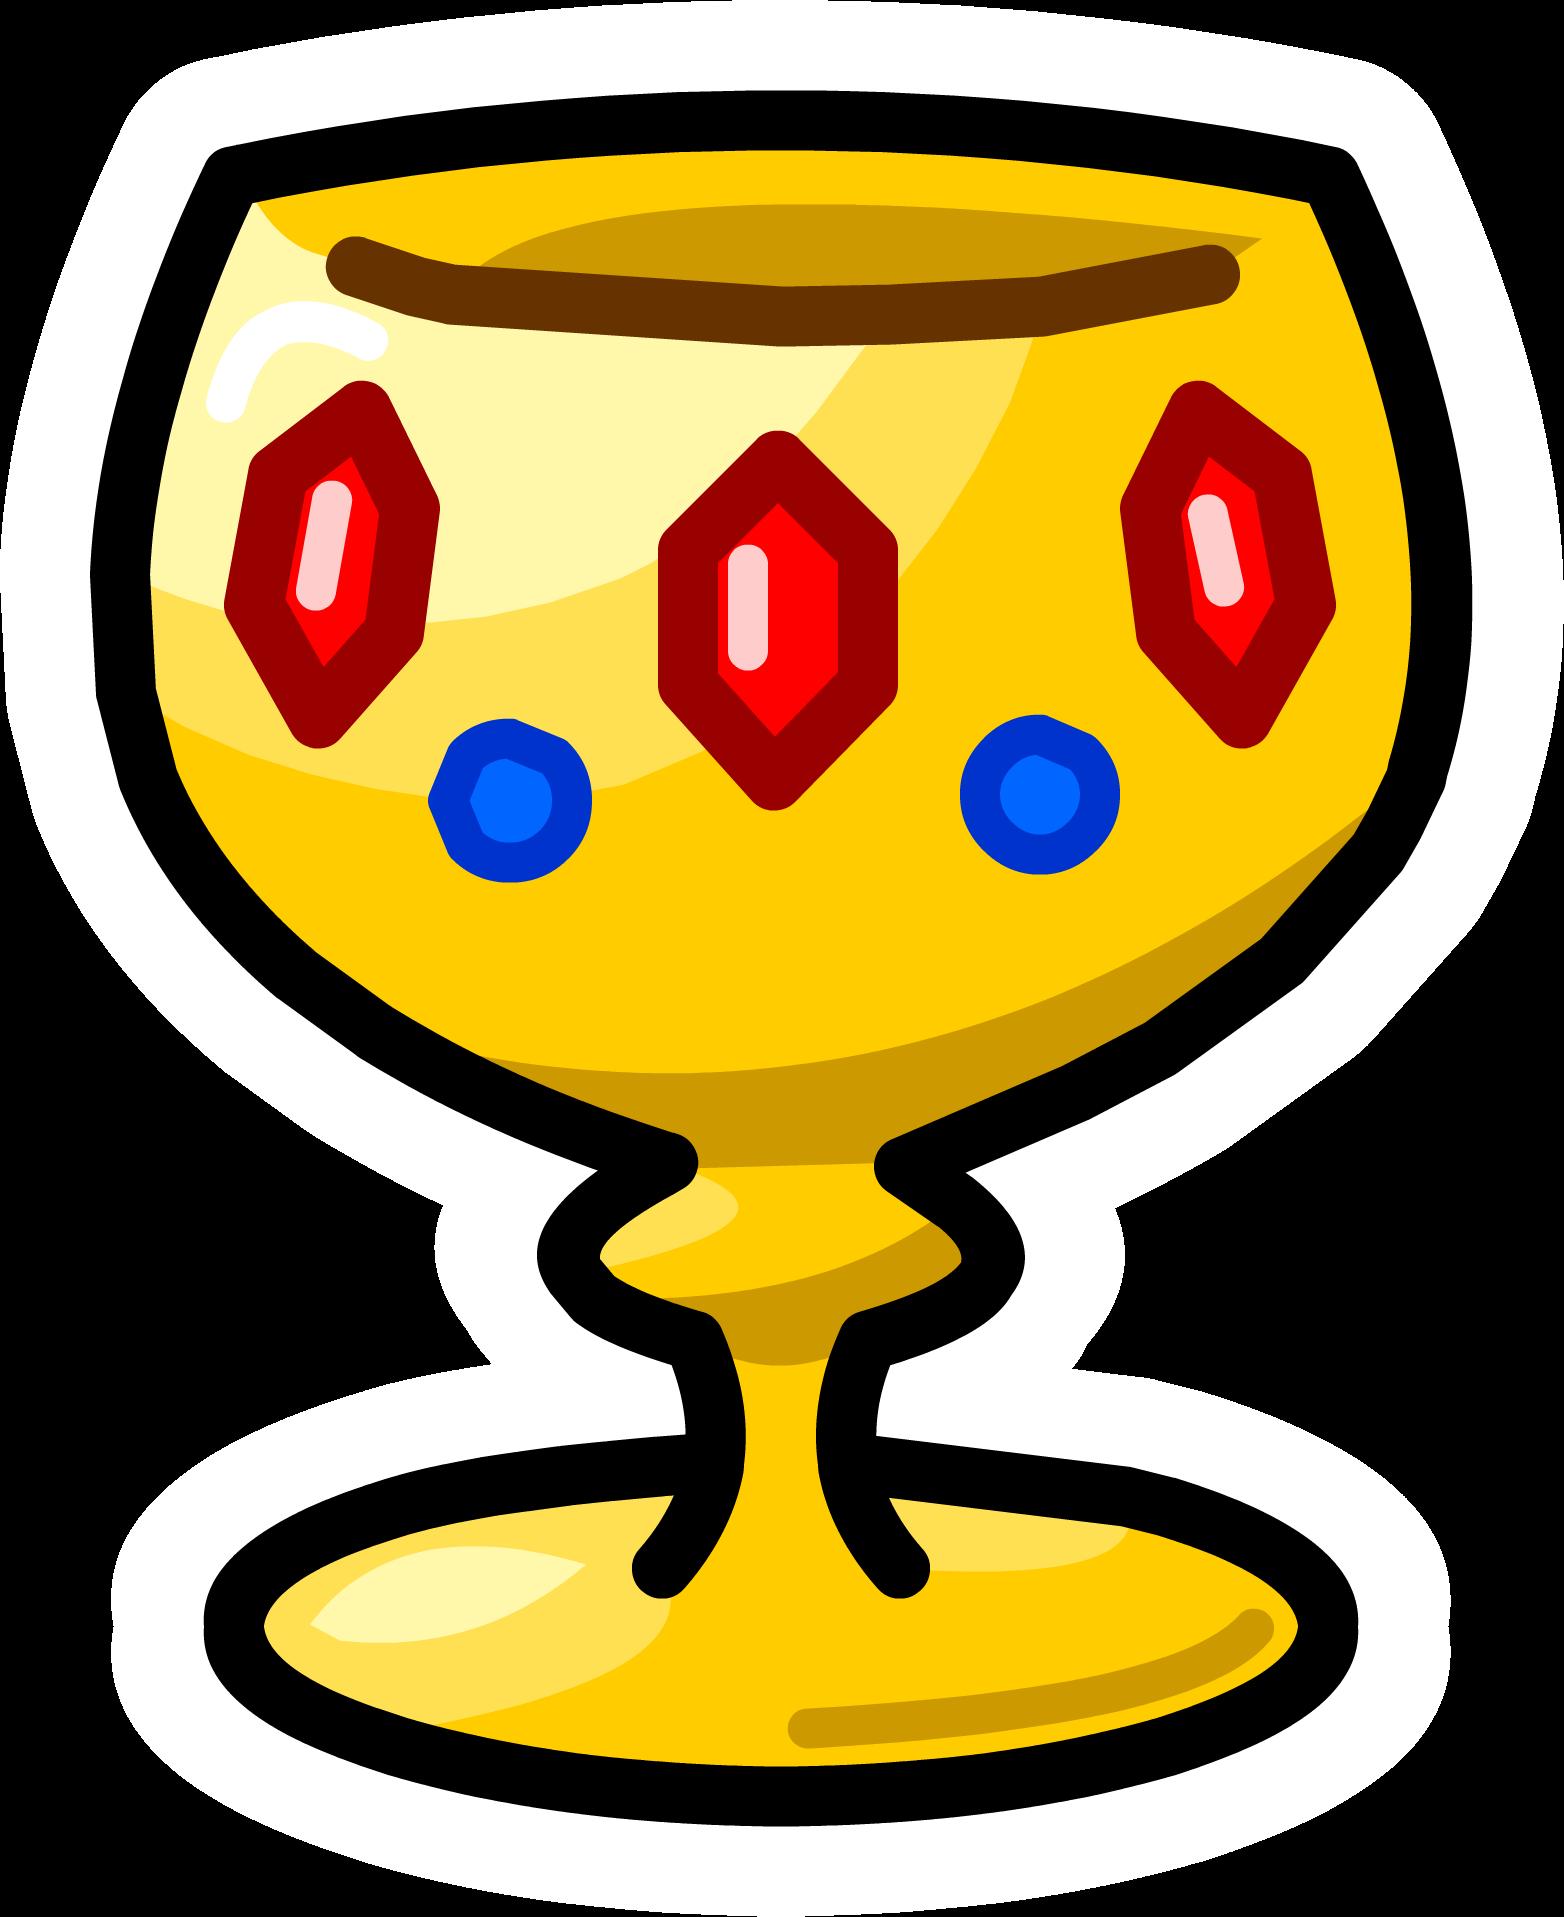 Goblet Clipart.